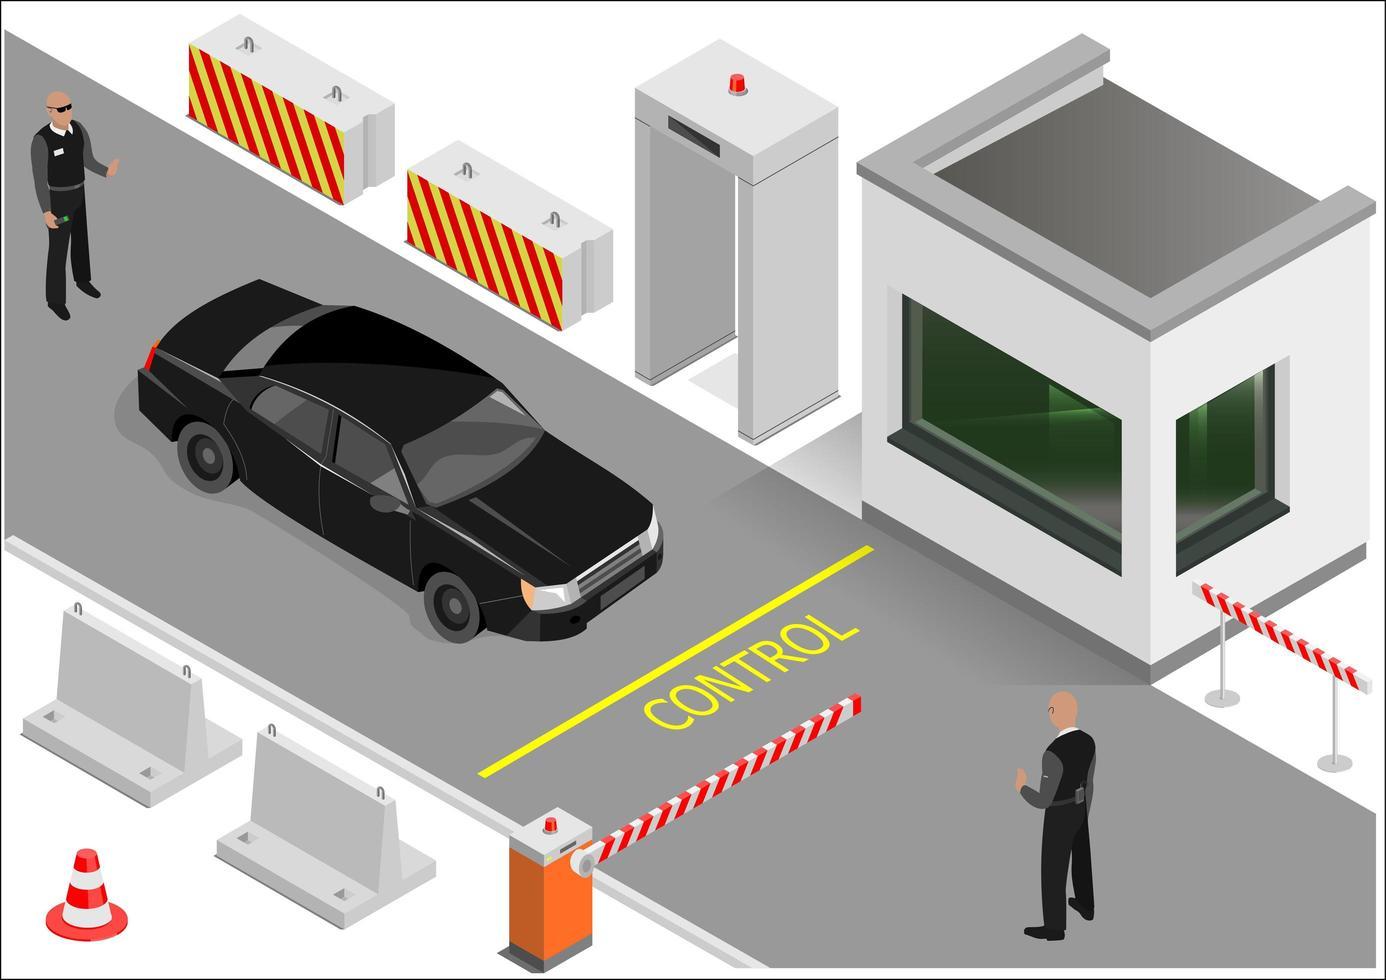 edificio de guardia isométrica o punto de aduana vector